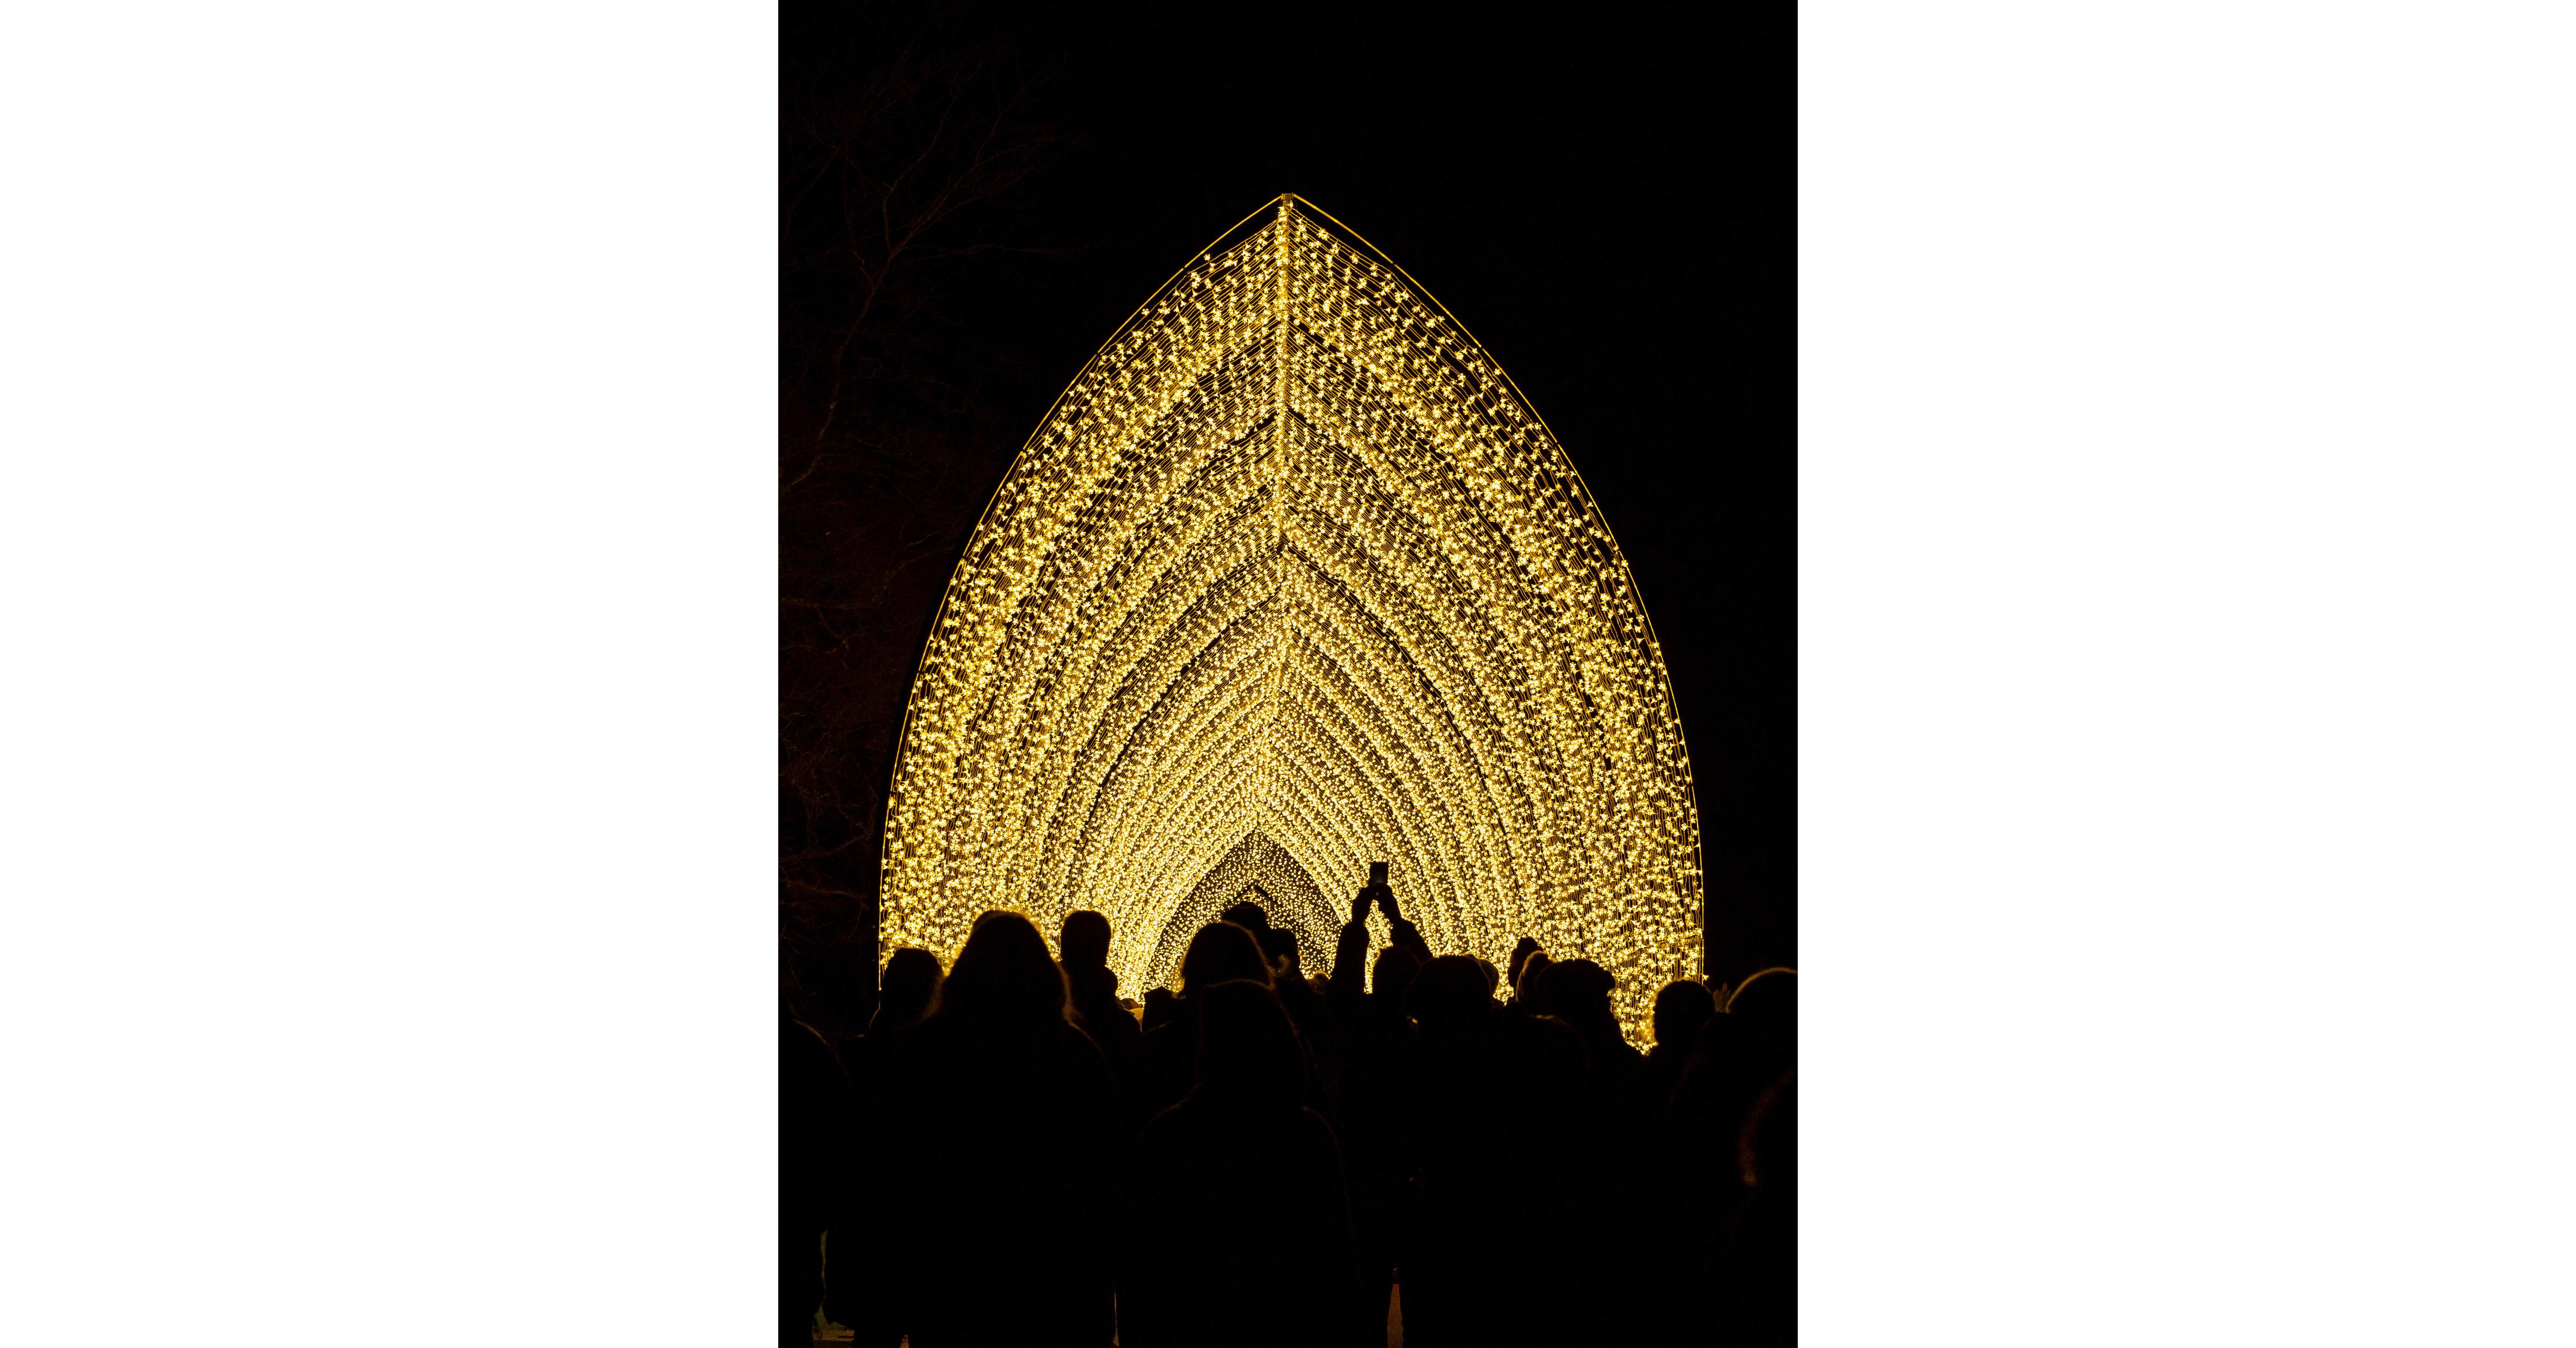 Chicago Botanic Garden Introduces Lightscape For 2019 Holiday Season